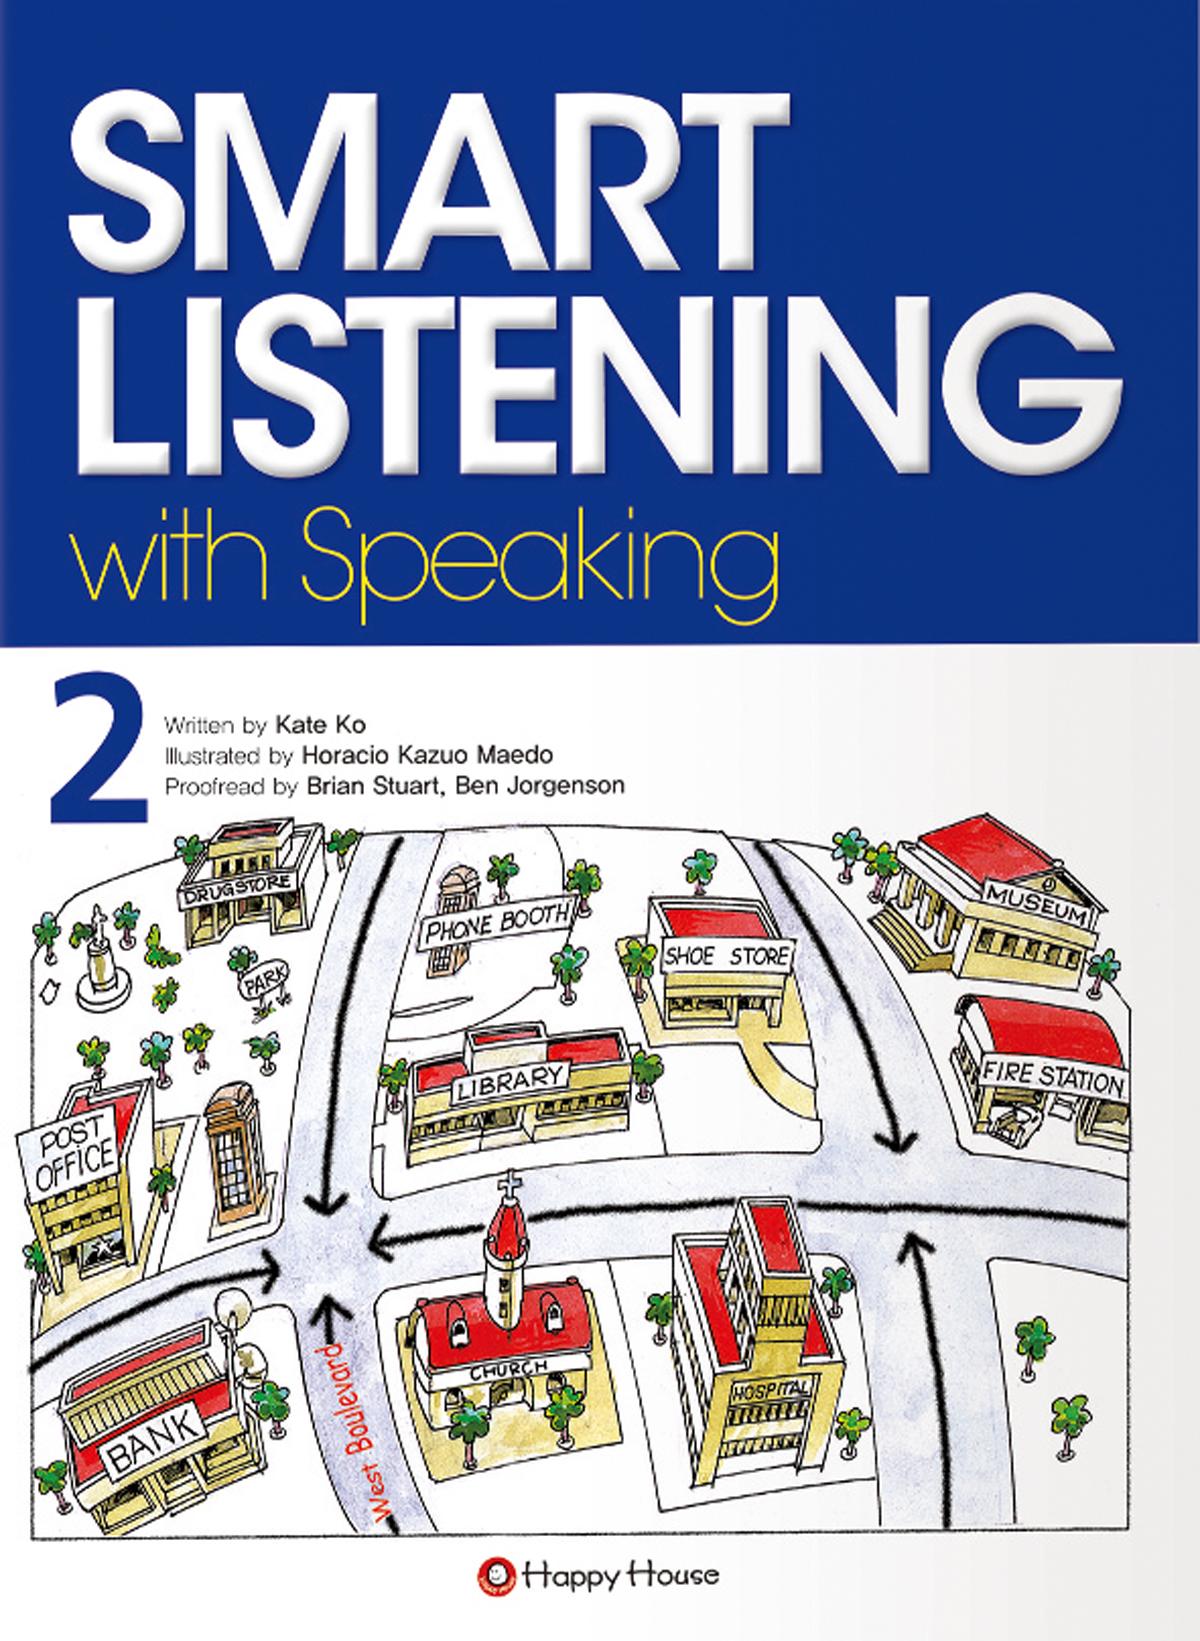 SMART LISTENING with Speaking ② (개정판)